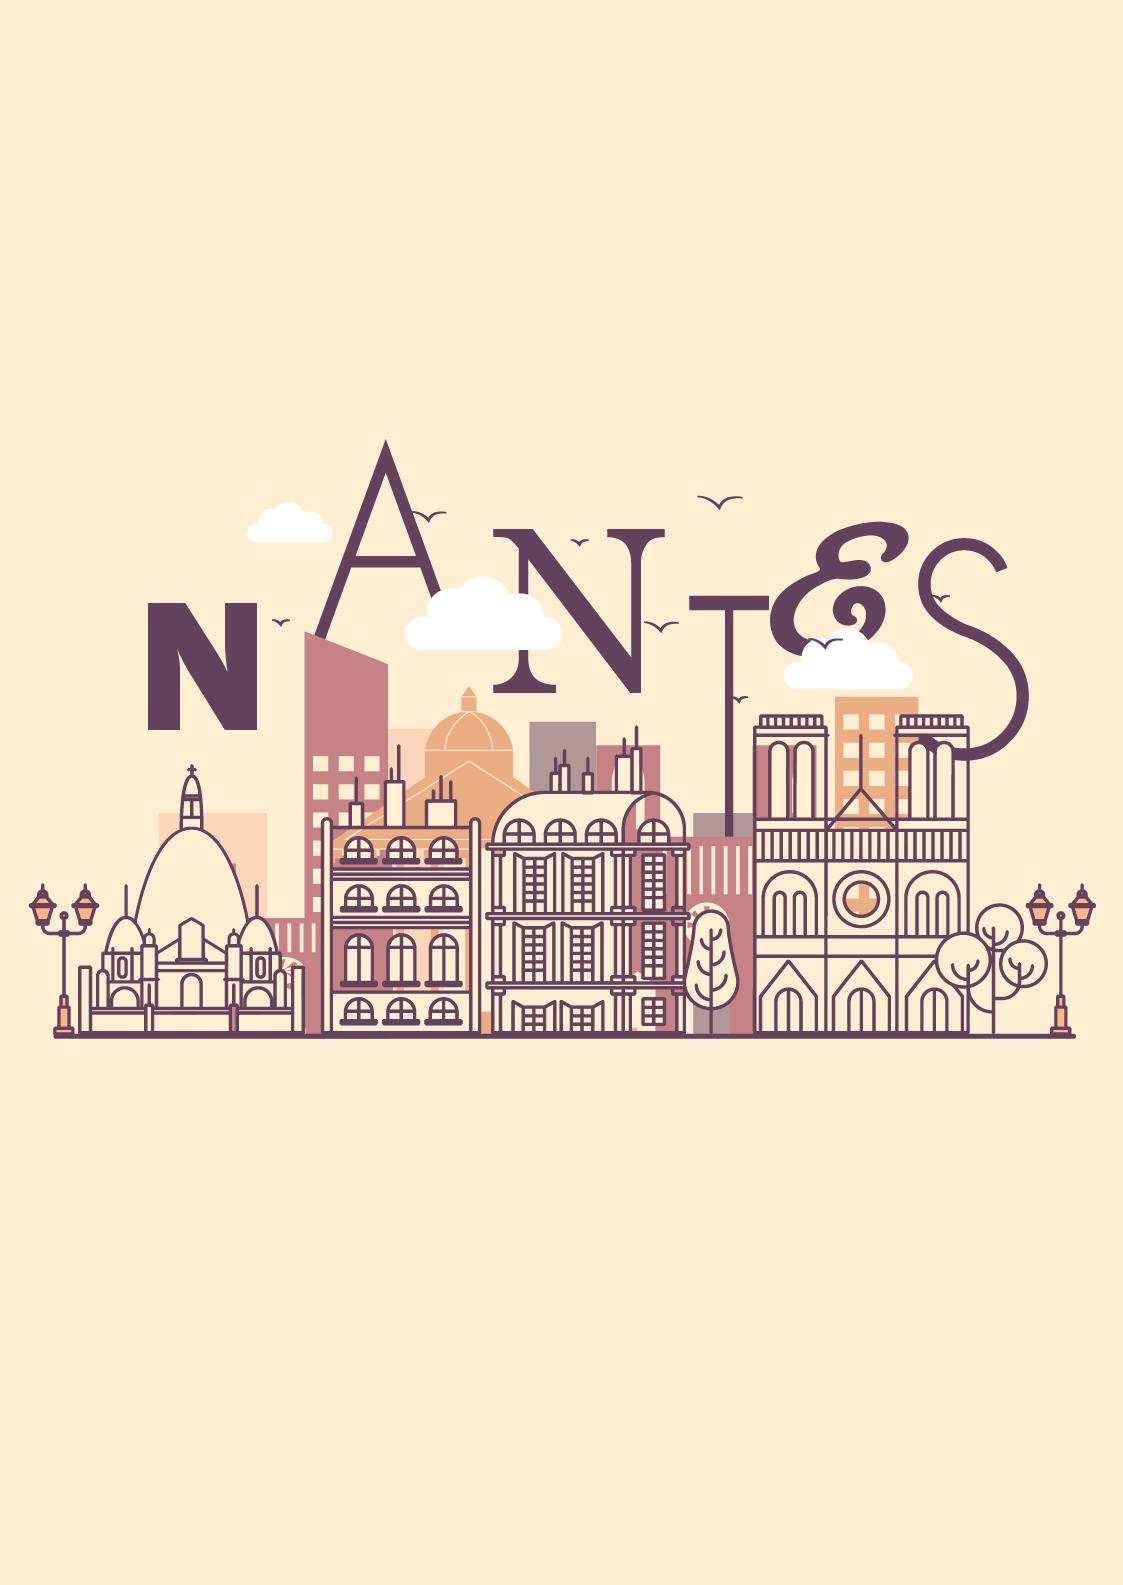 nantes-01.png